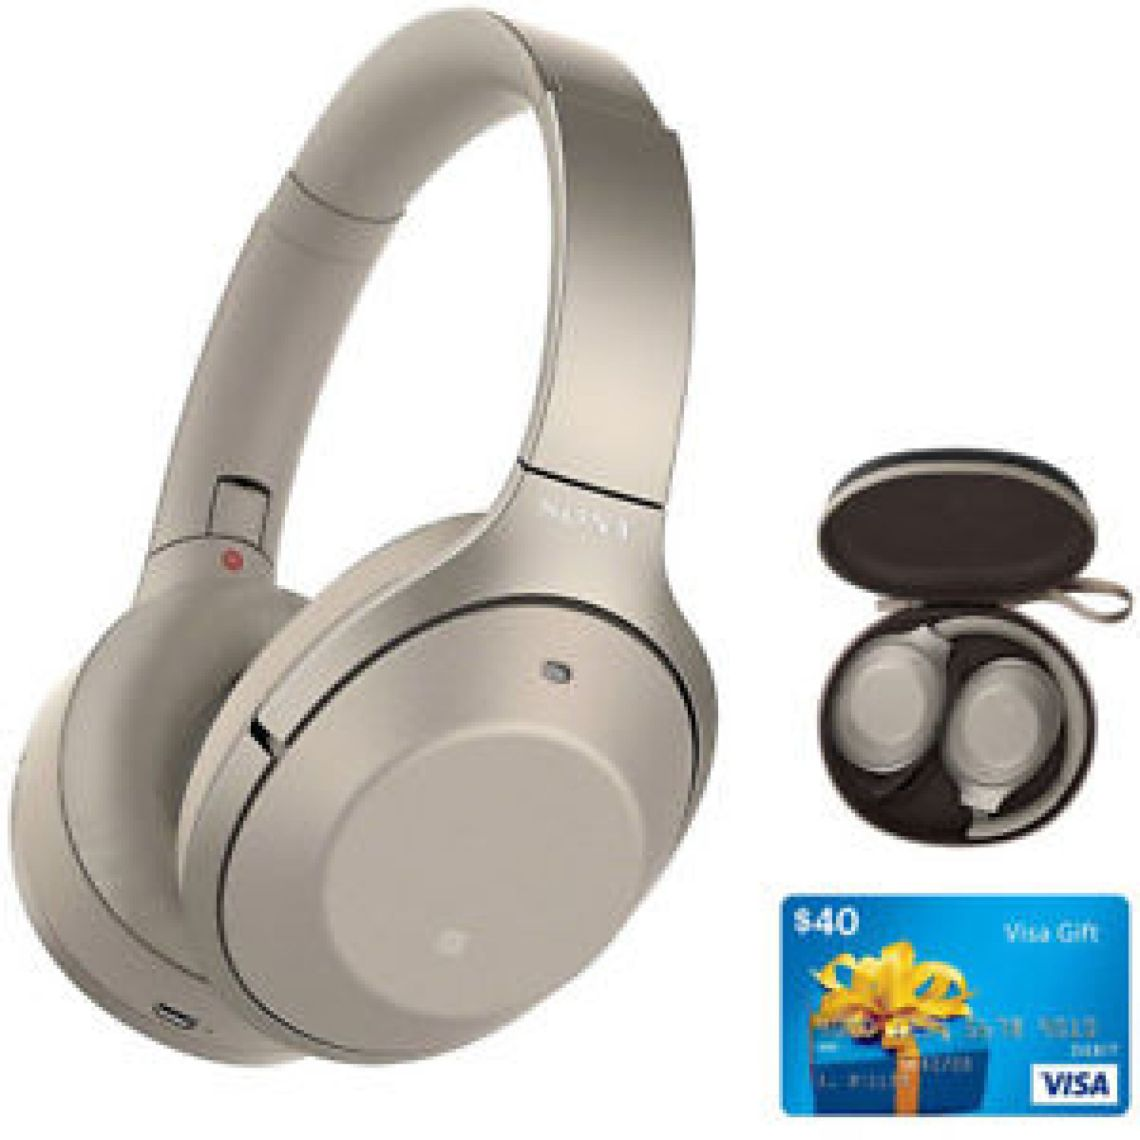 Sony WH1000XM2/N Noise Cancelling Wireless Headphones Bundle 27242907072 | eBay